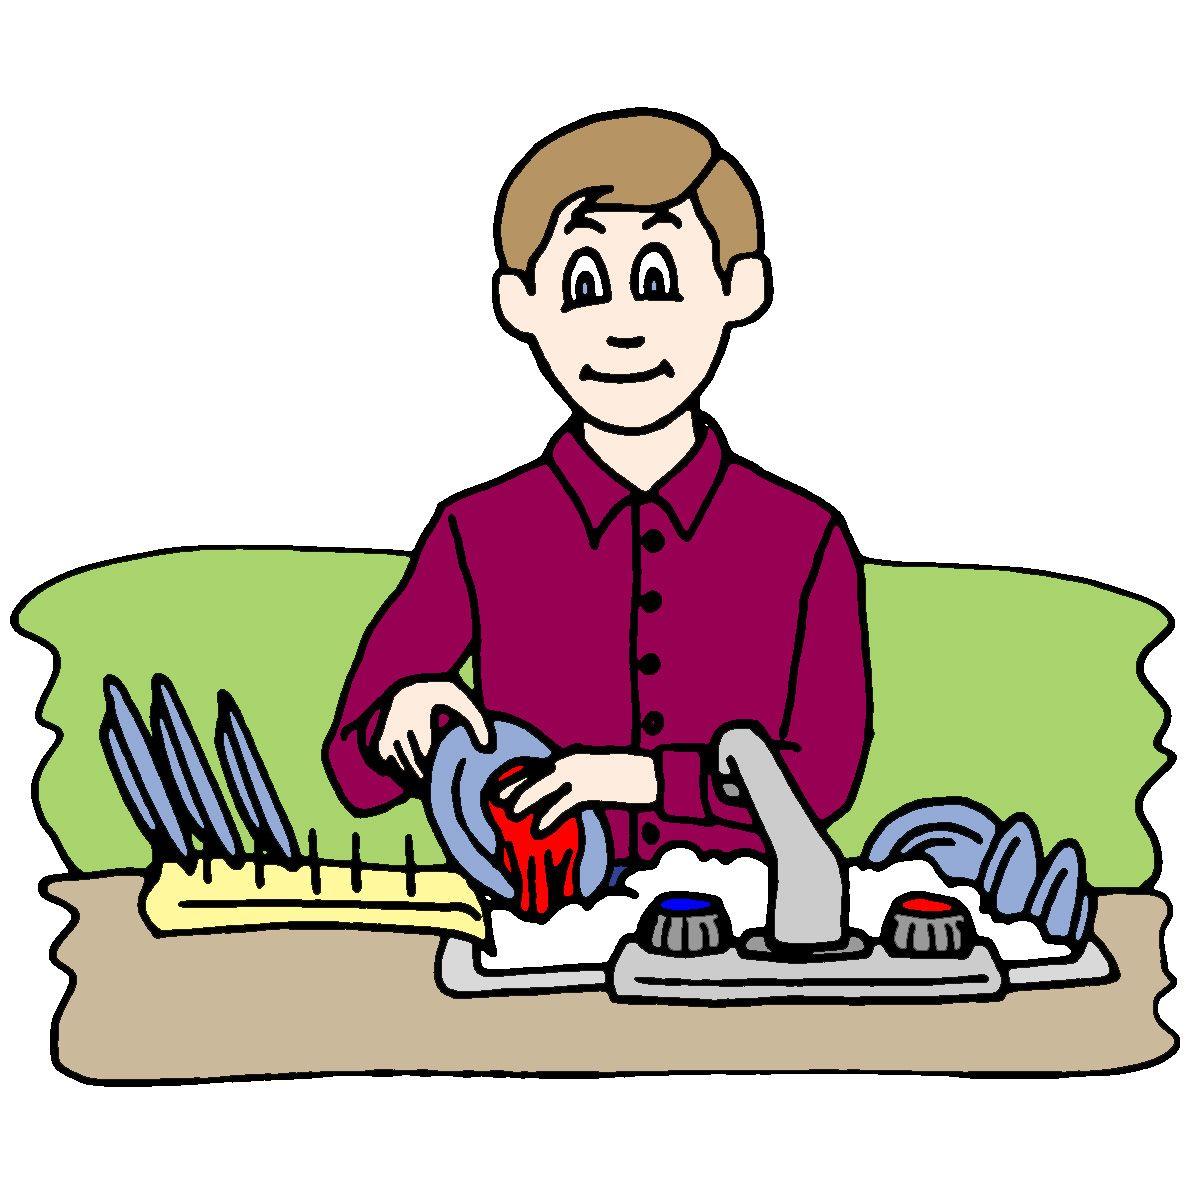 Washing Dishes Life Skills For Children Washing Dishes Life Skills